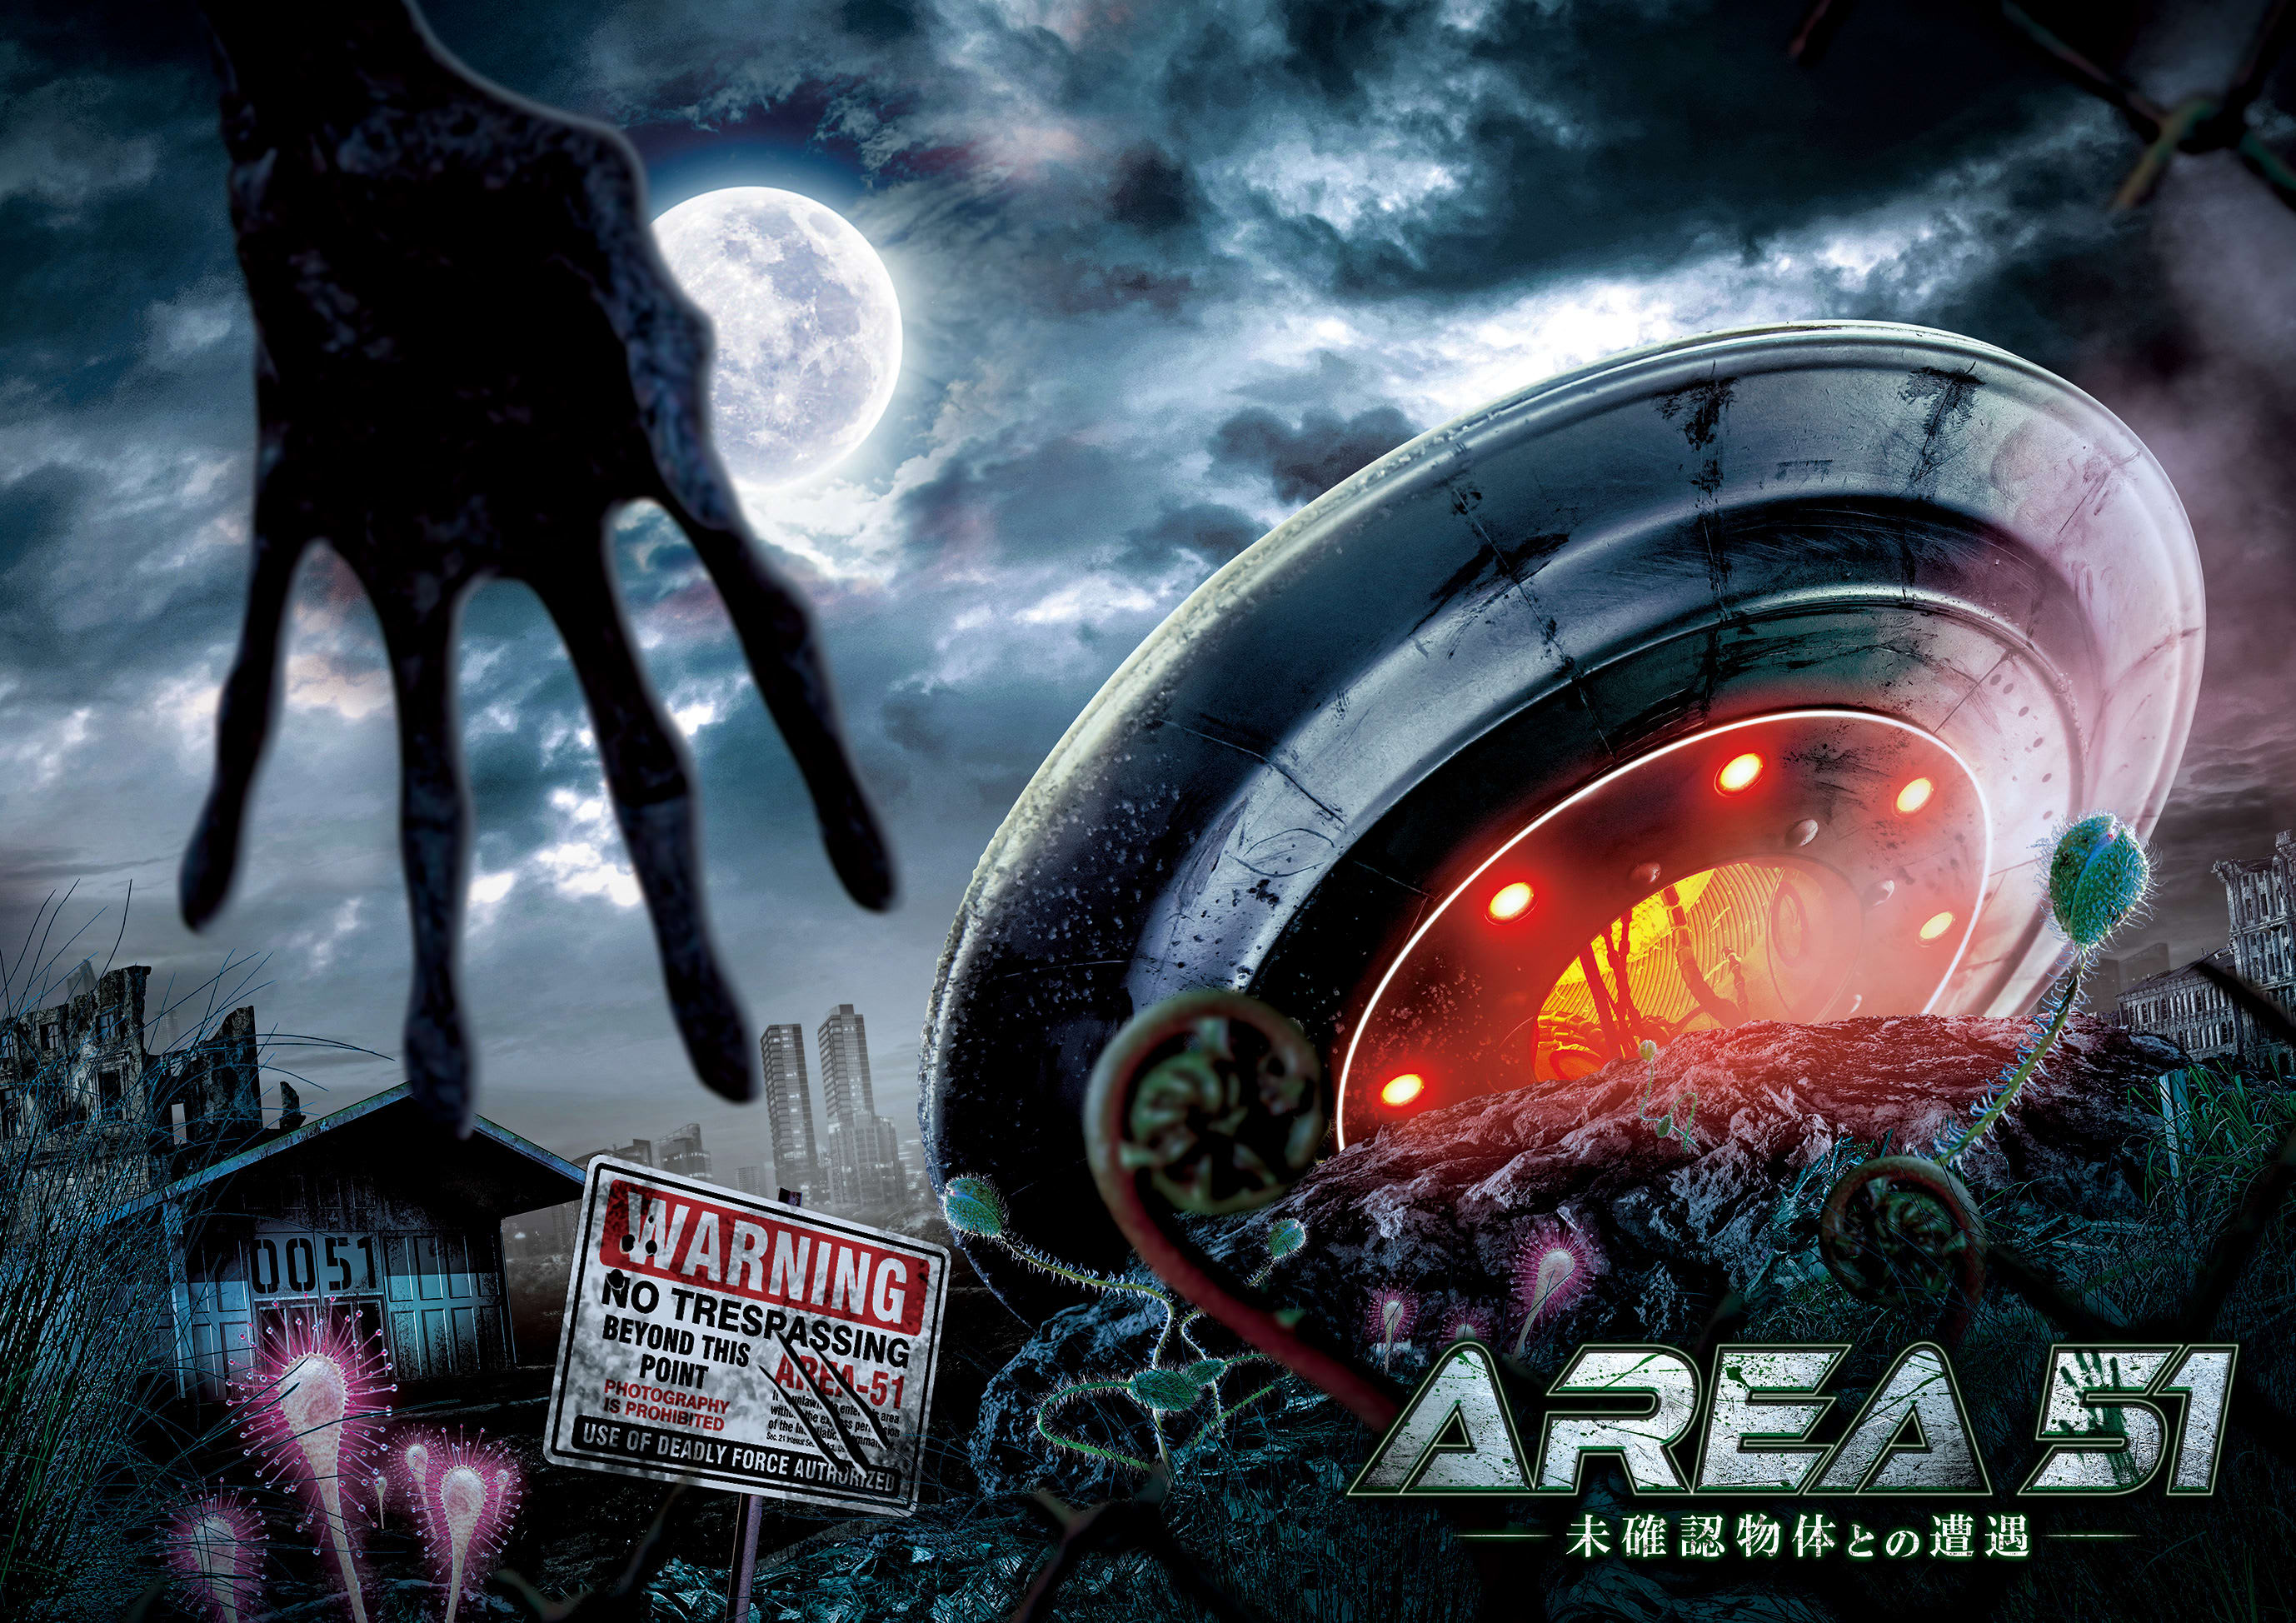 Area 51 - Unidentified Encounter